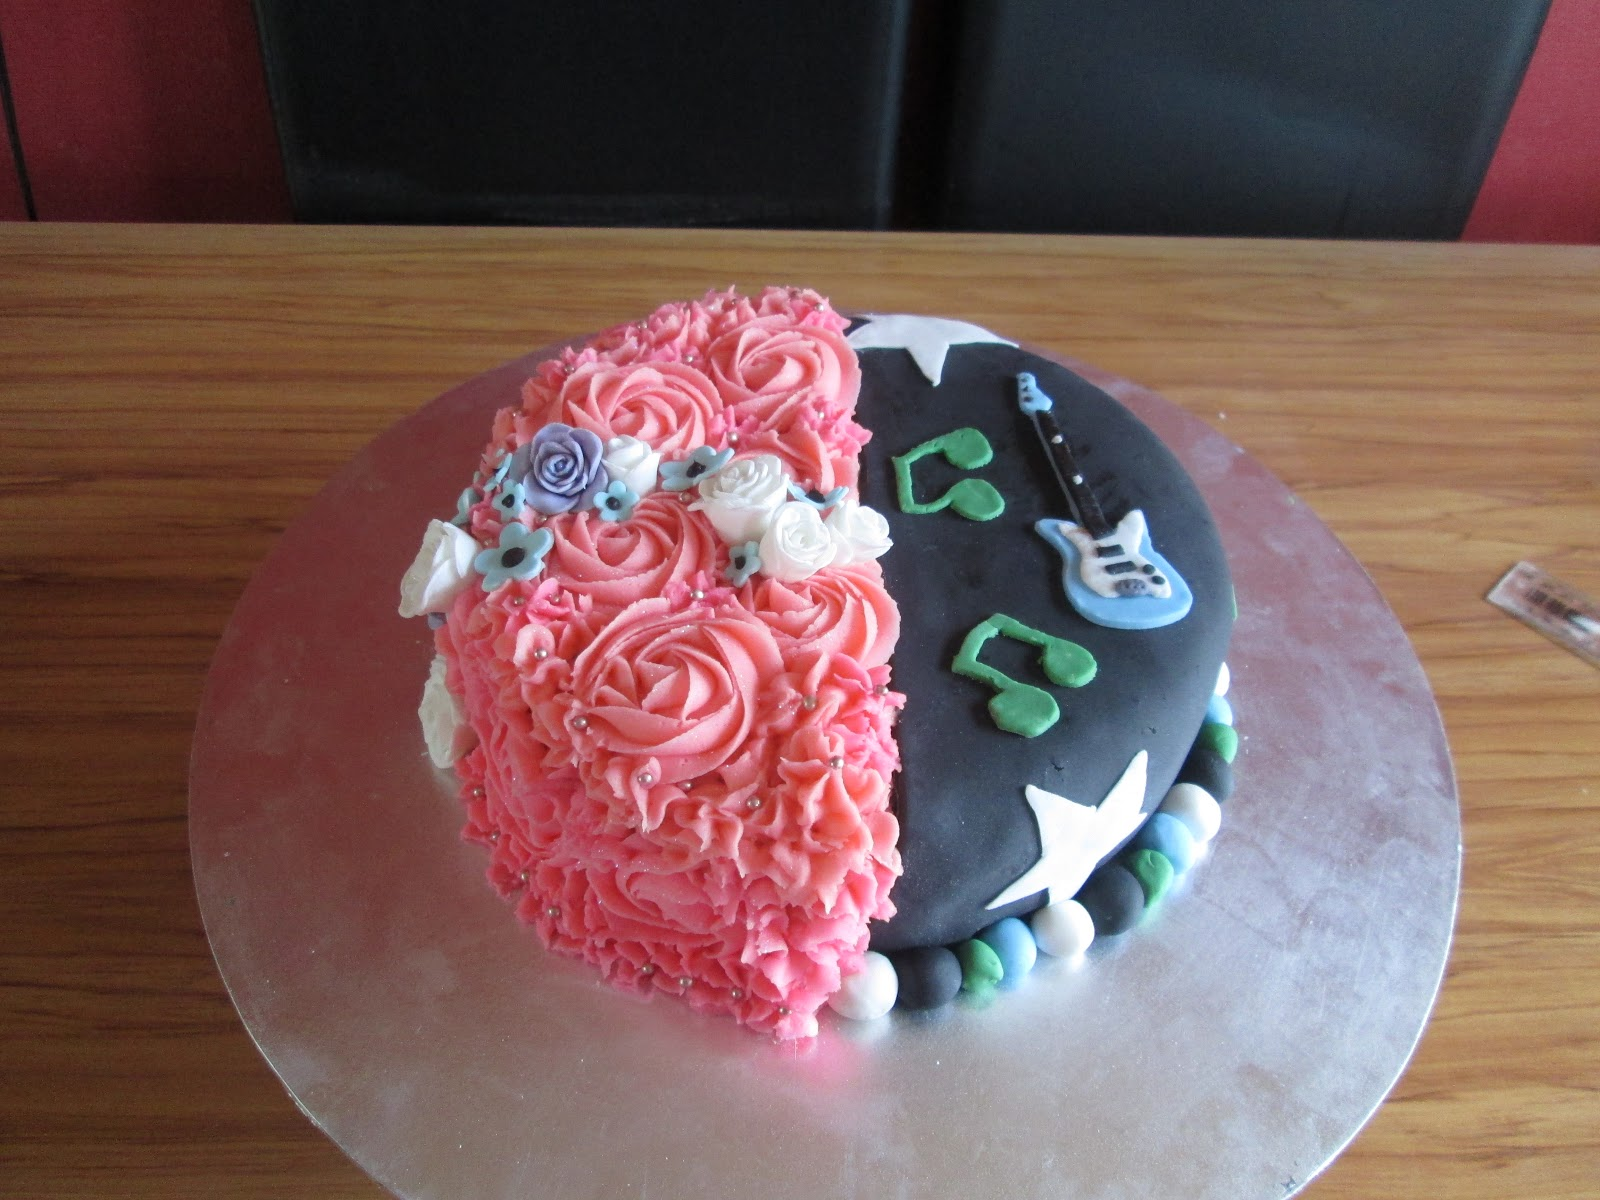 Astounding 6 Half Boy And Girl Birthday Cakes Photo Half Boy Half Girl Personalised Birthday Cards Paralily Jamesorg